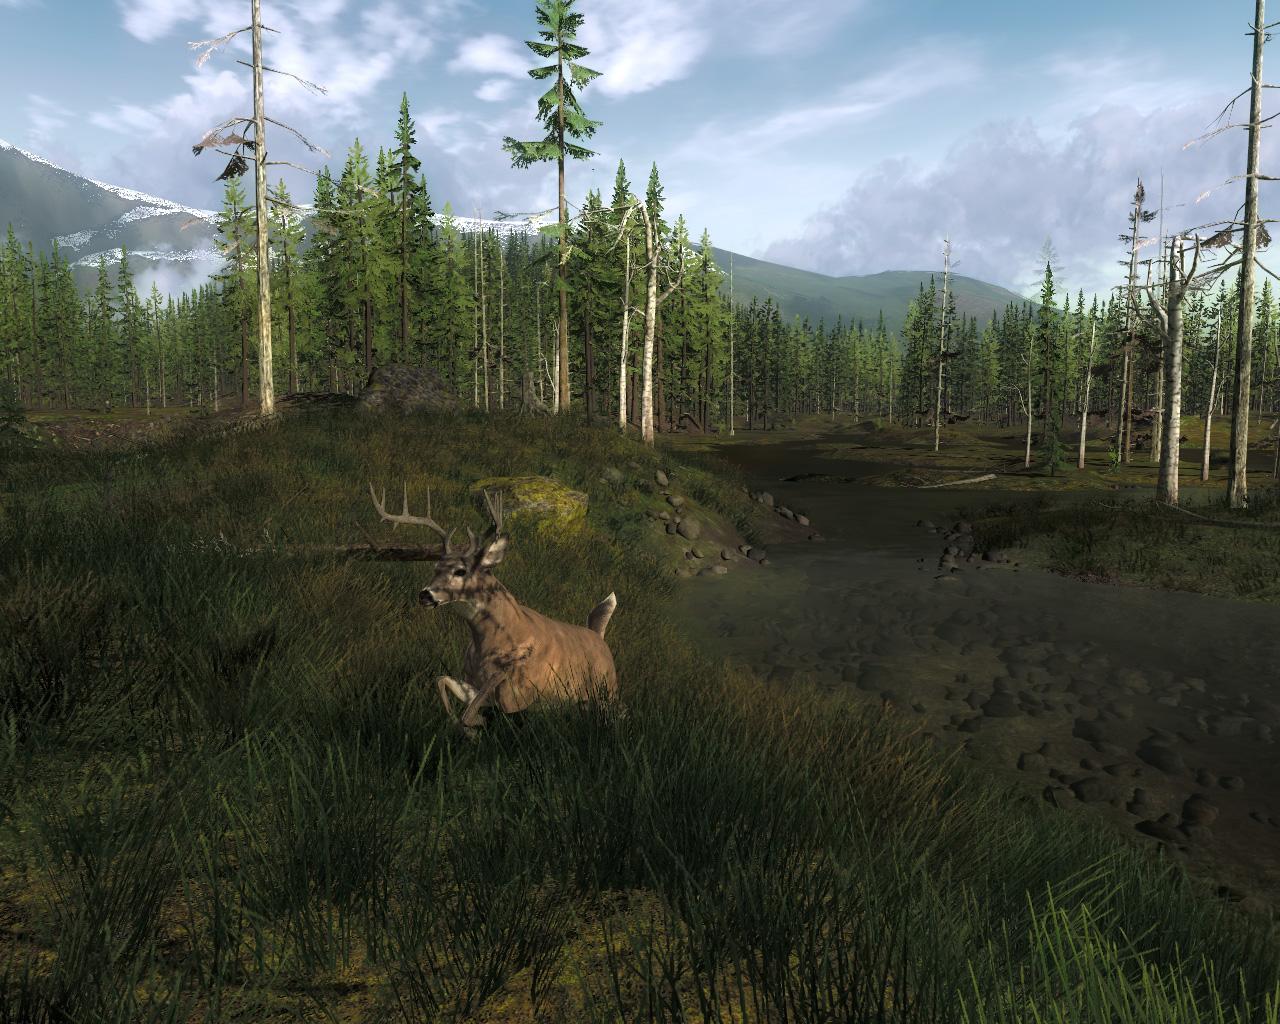 jagd spiele kostenlos